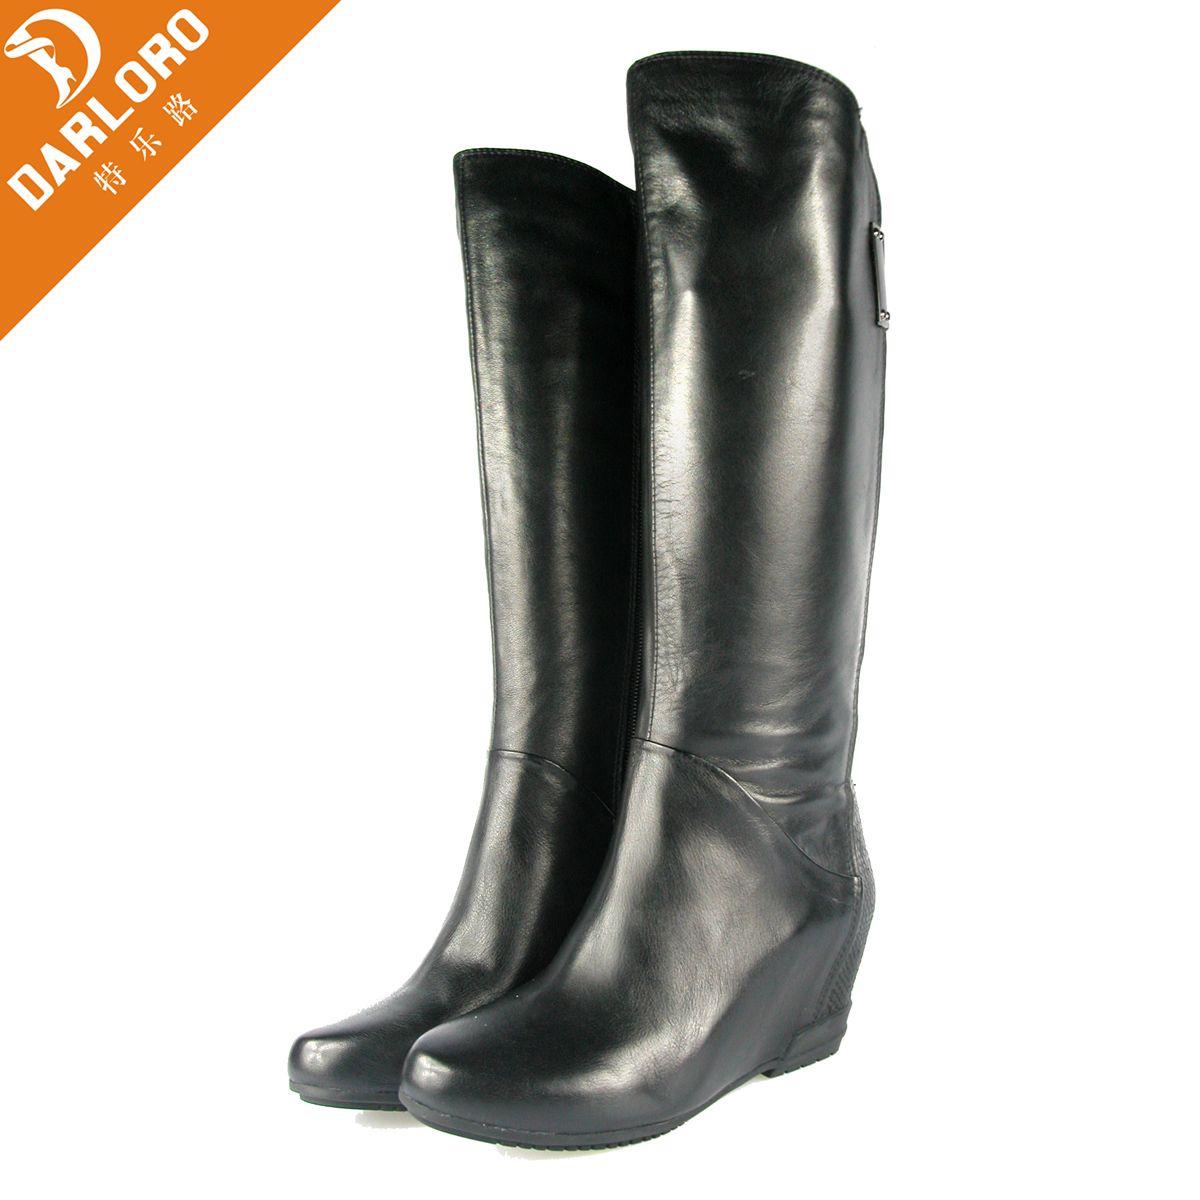 Женские сапоги Darloro 4223688 blk 2012